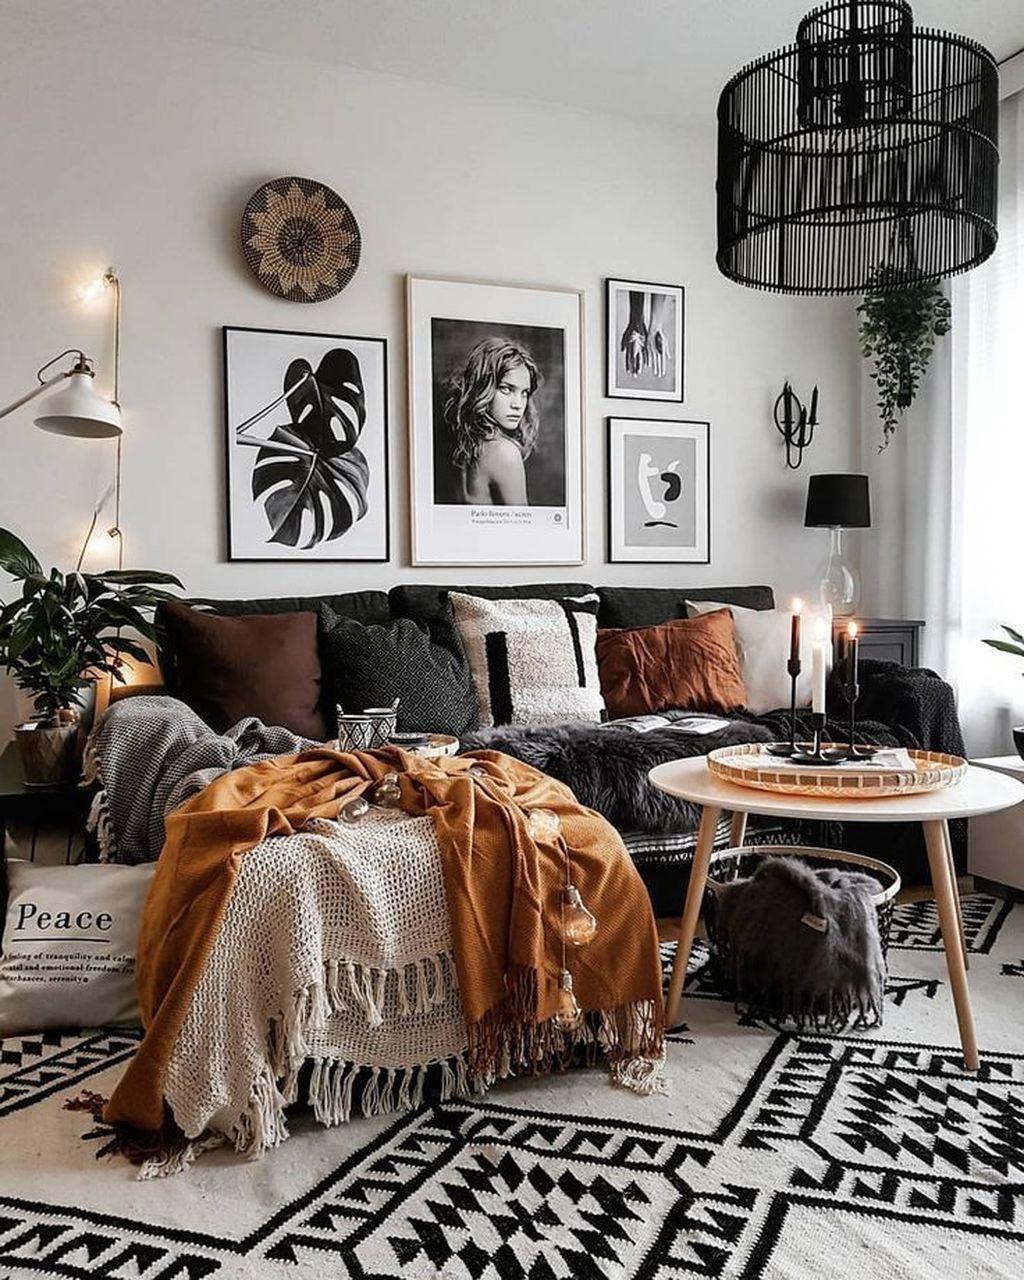 cool 20 stylish bohemian style living room decoration ideas in 2020 modern boho living room on boho chic decor living room bohemian kitchen id=30243